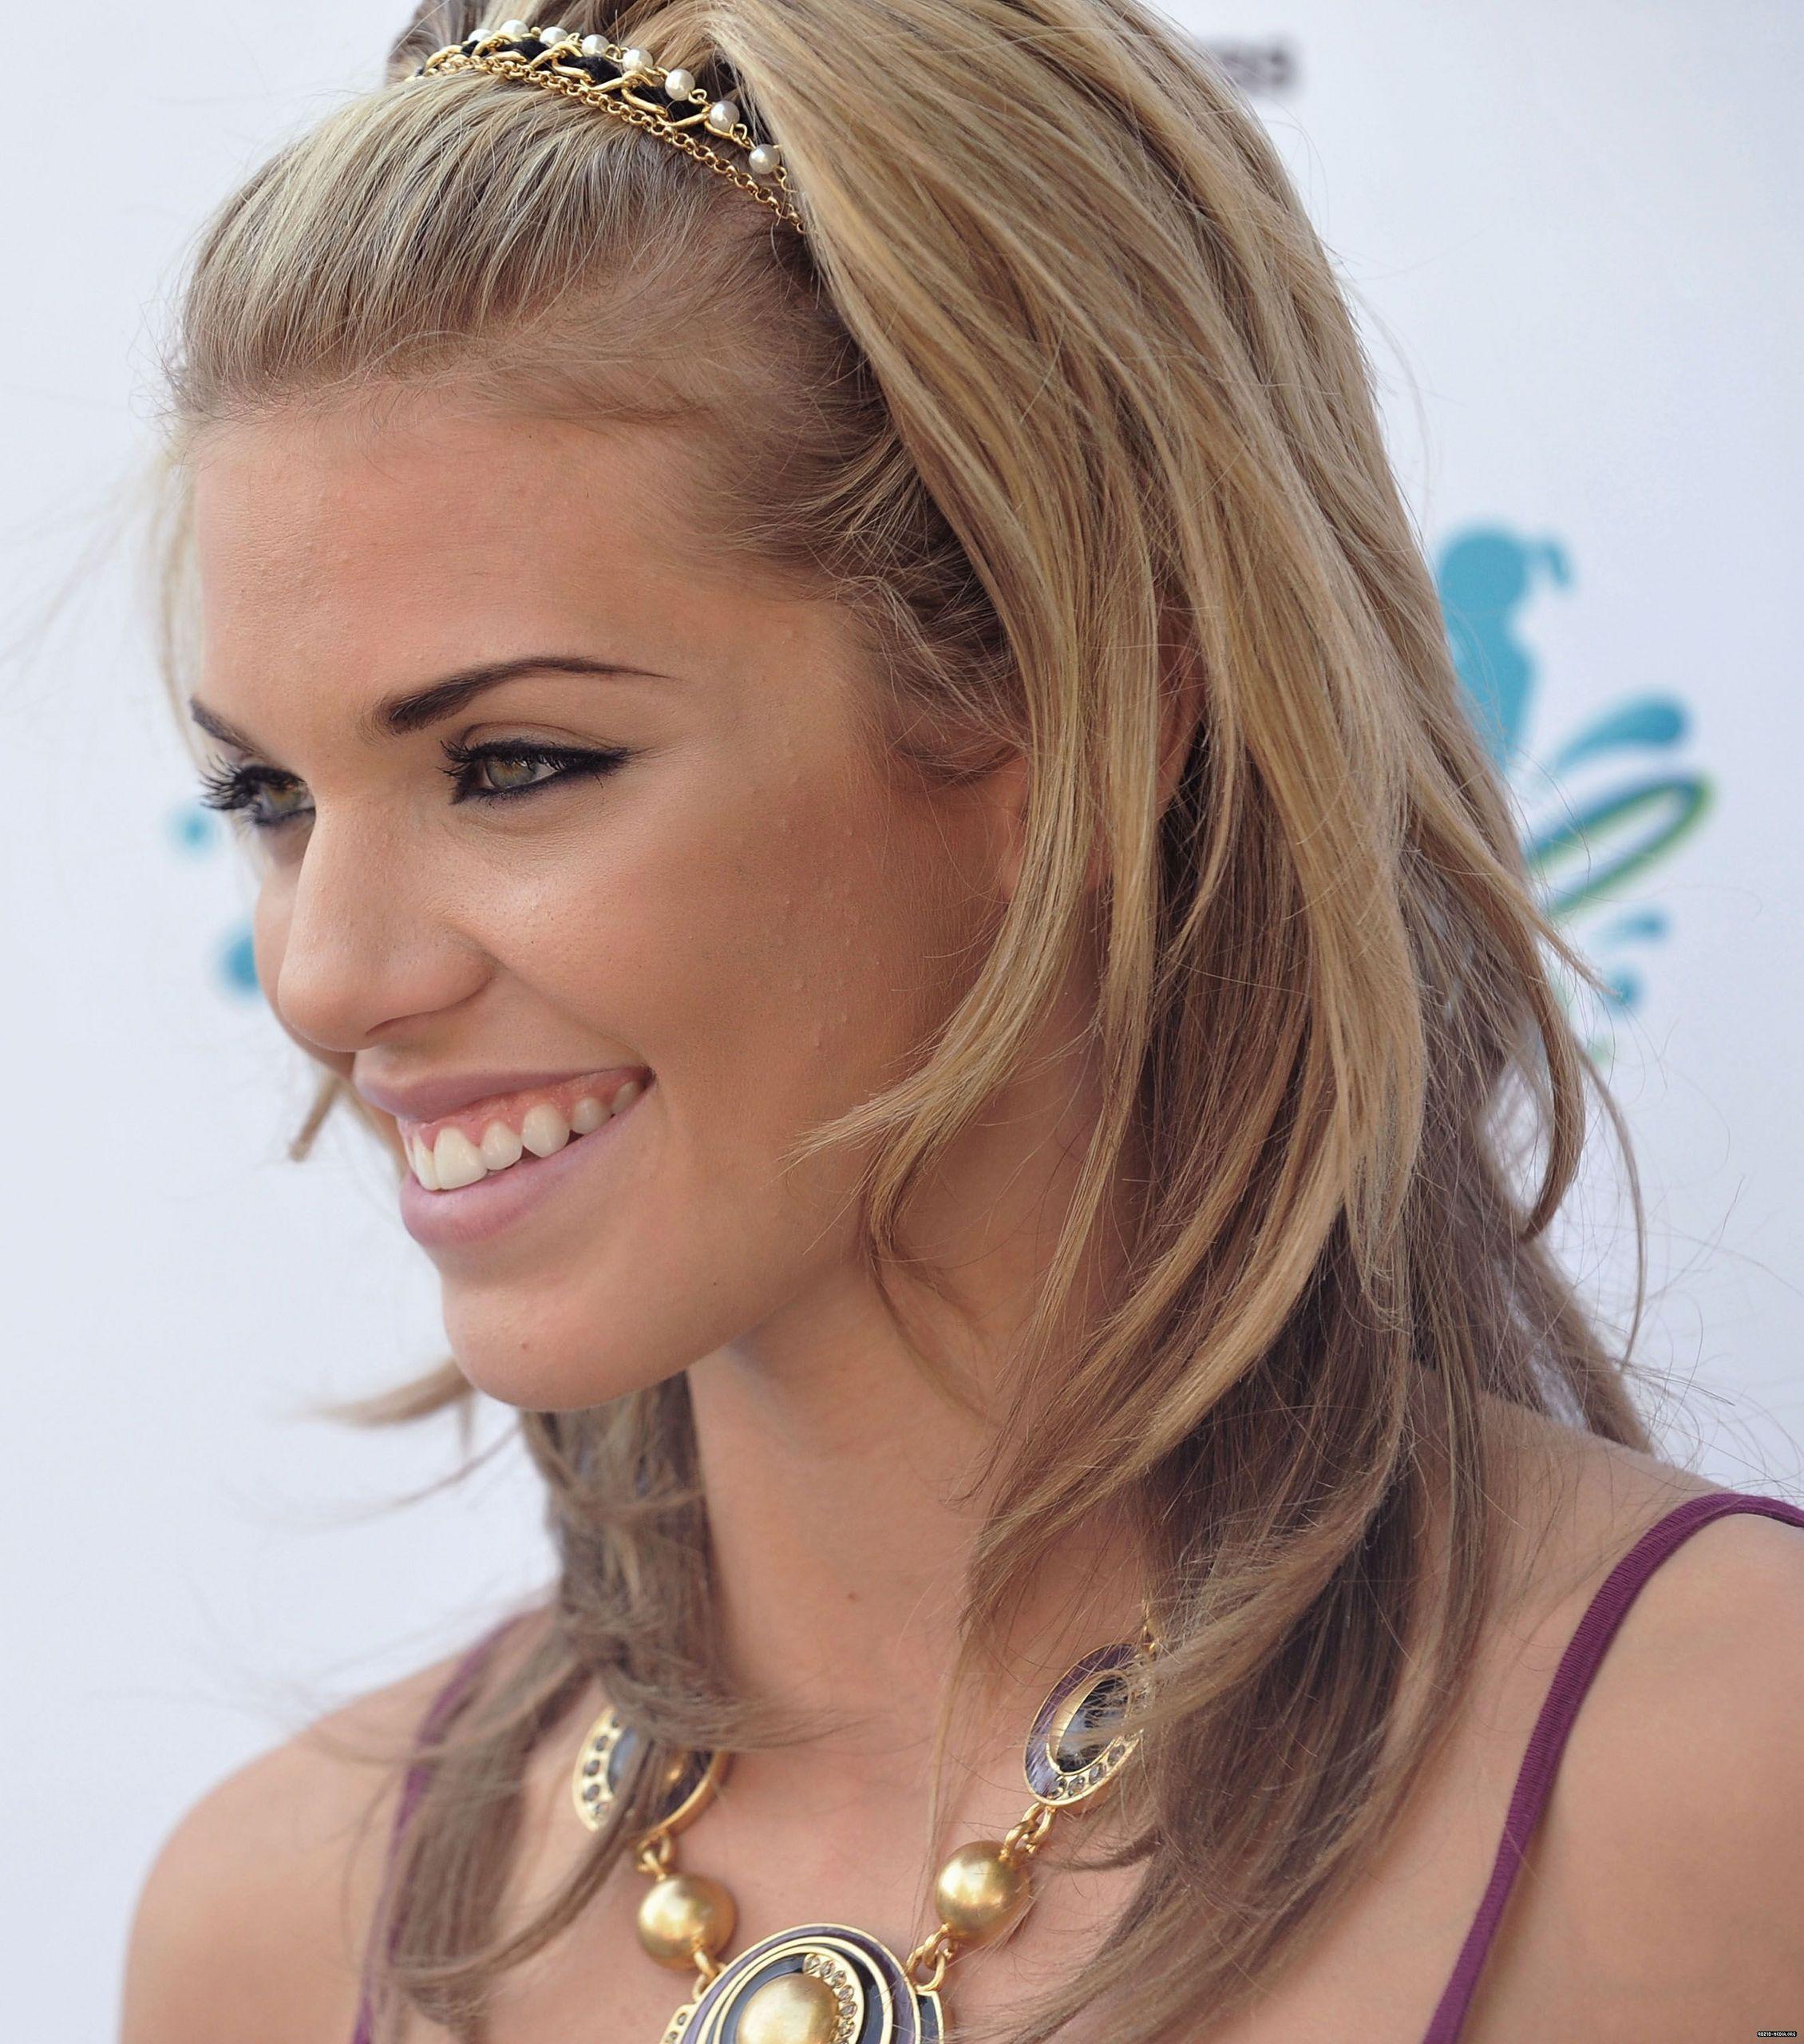 annalynne-mccord-cute-smile